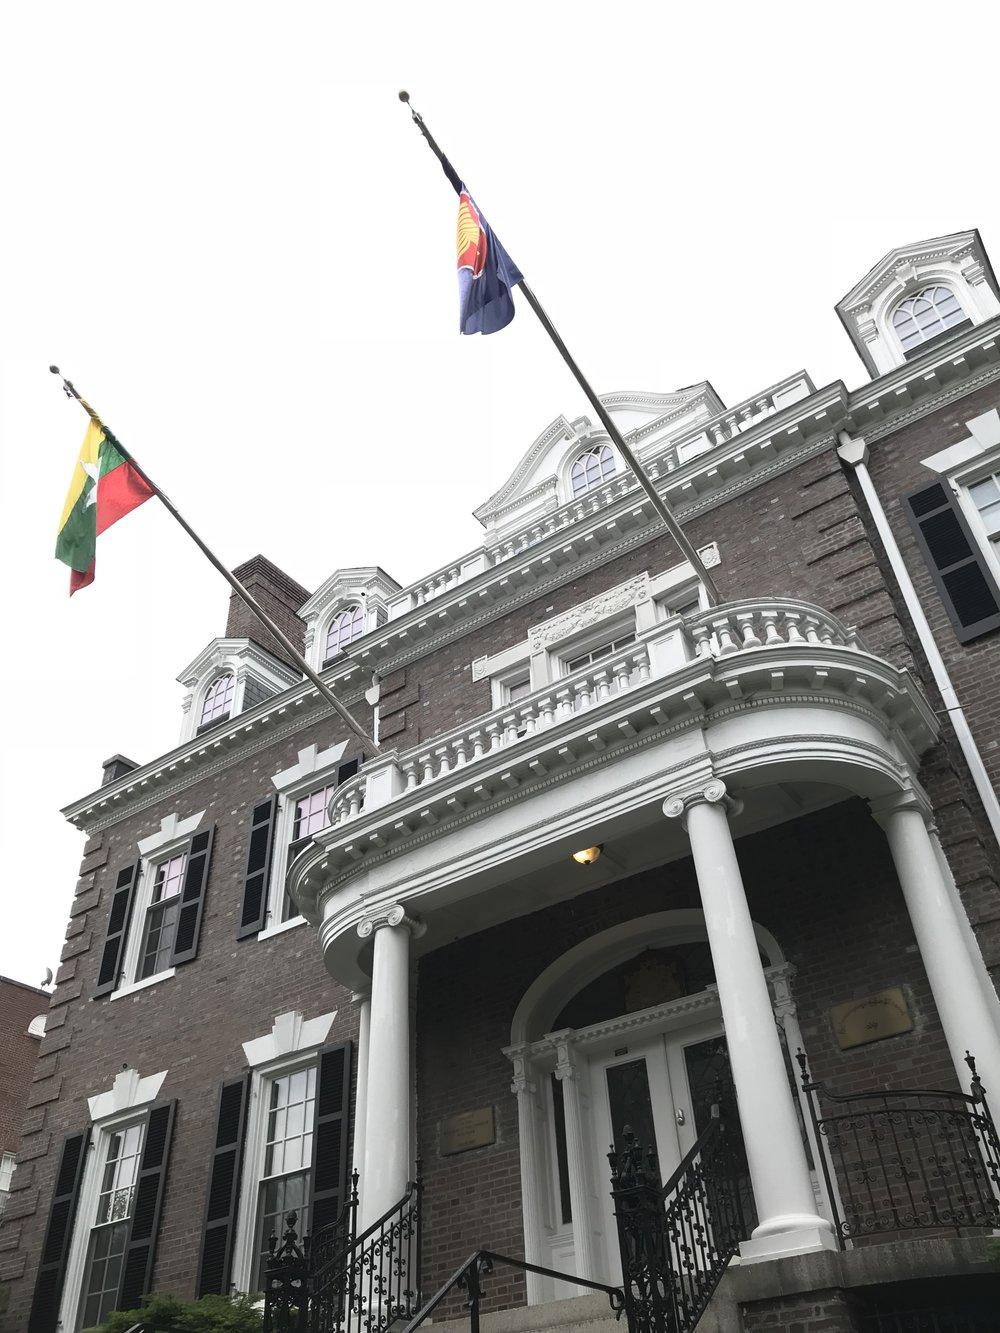 The Embassy of Myanmar.